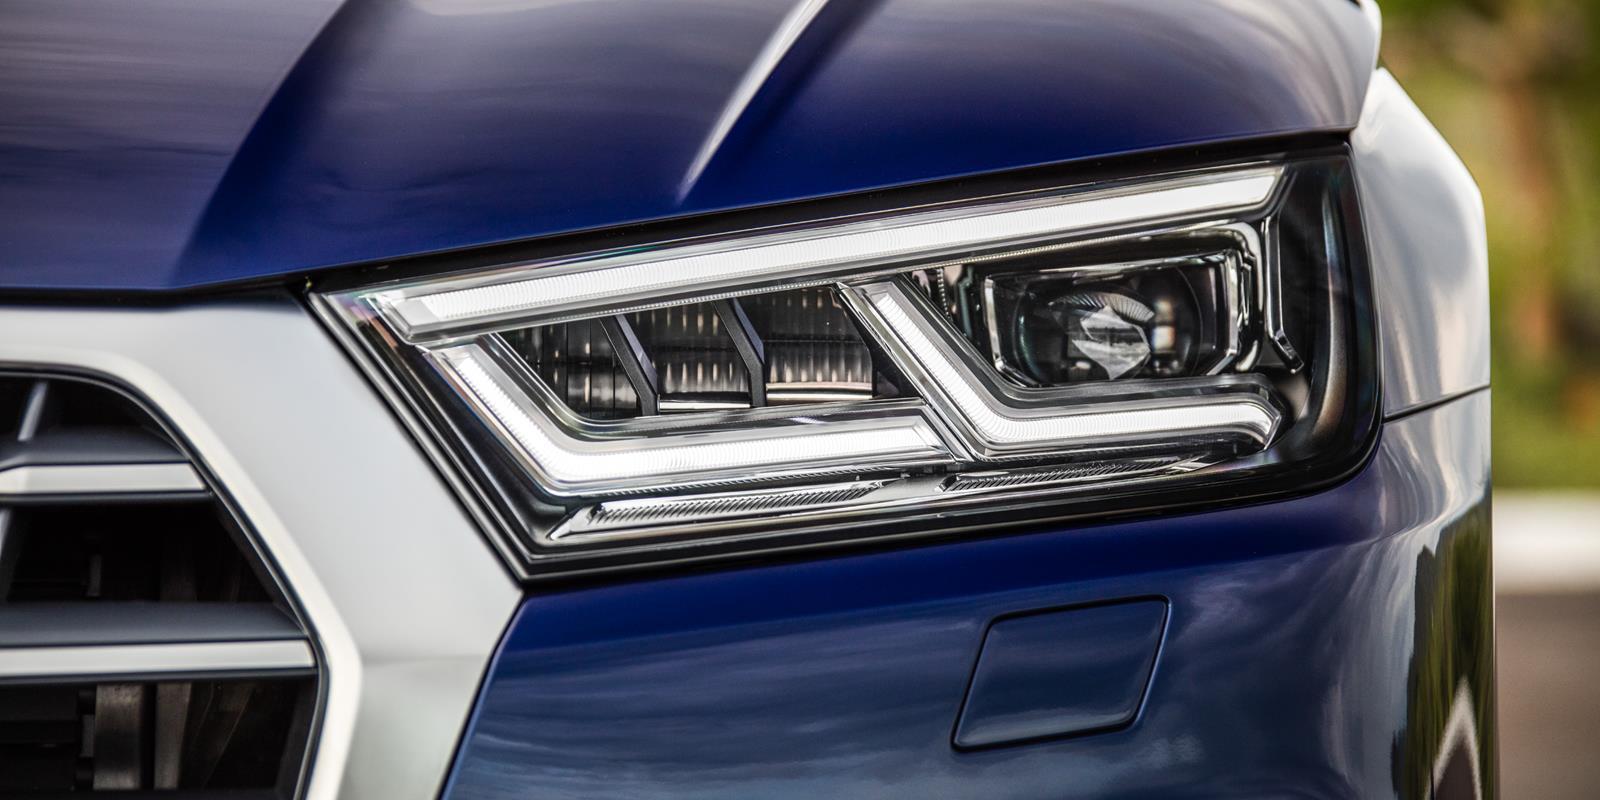 Audi Q5 photo 171921